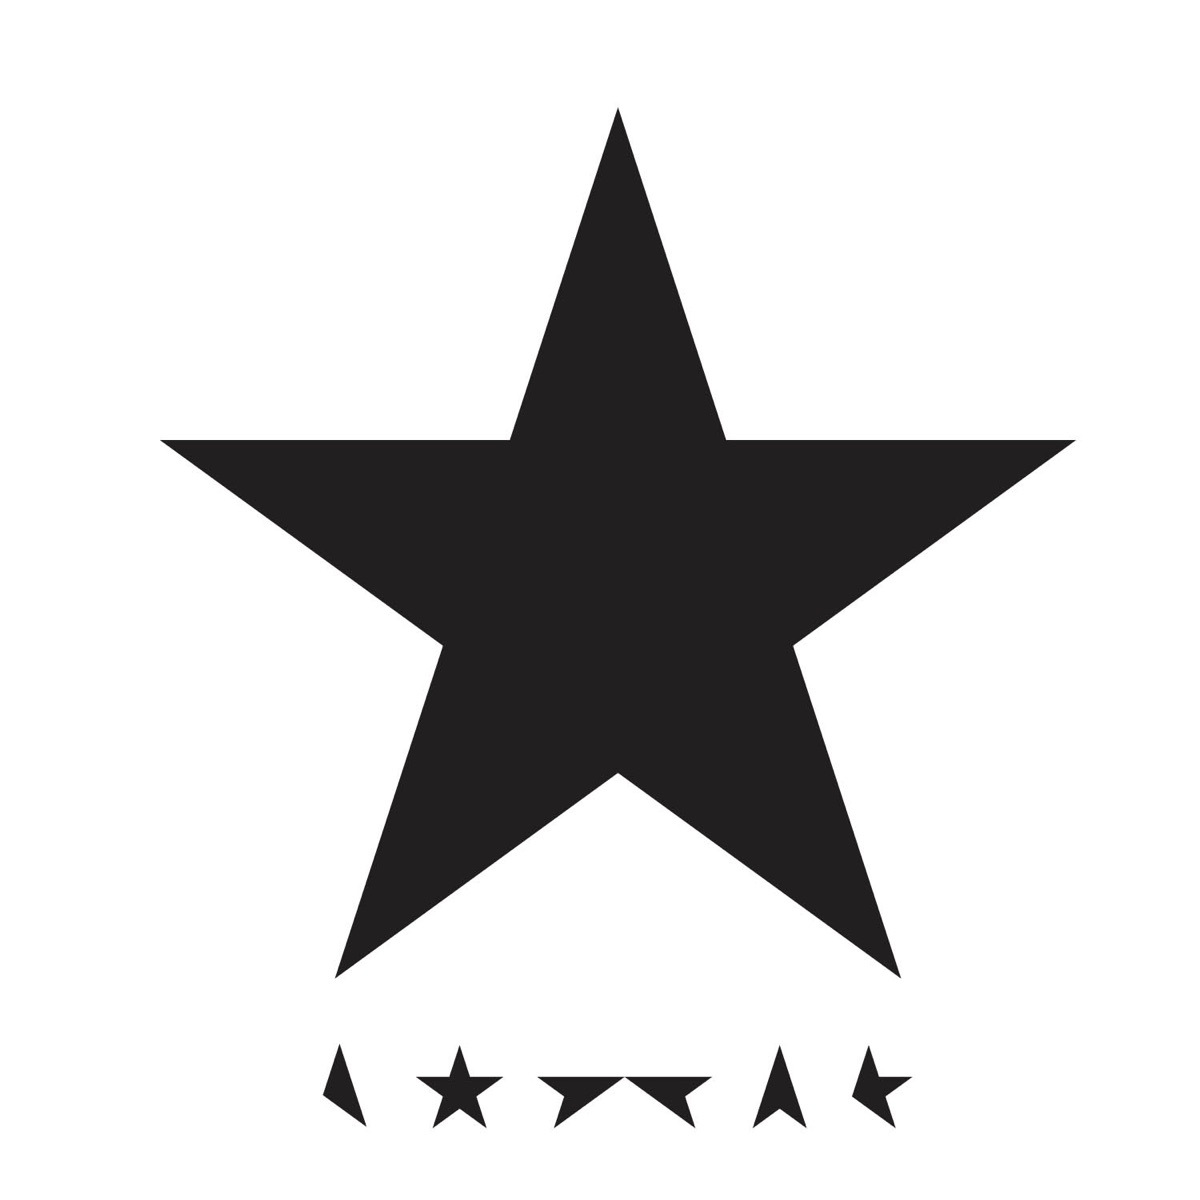 Blackstar David Bowie CD cover